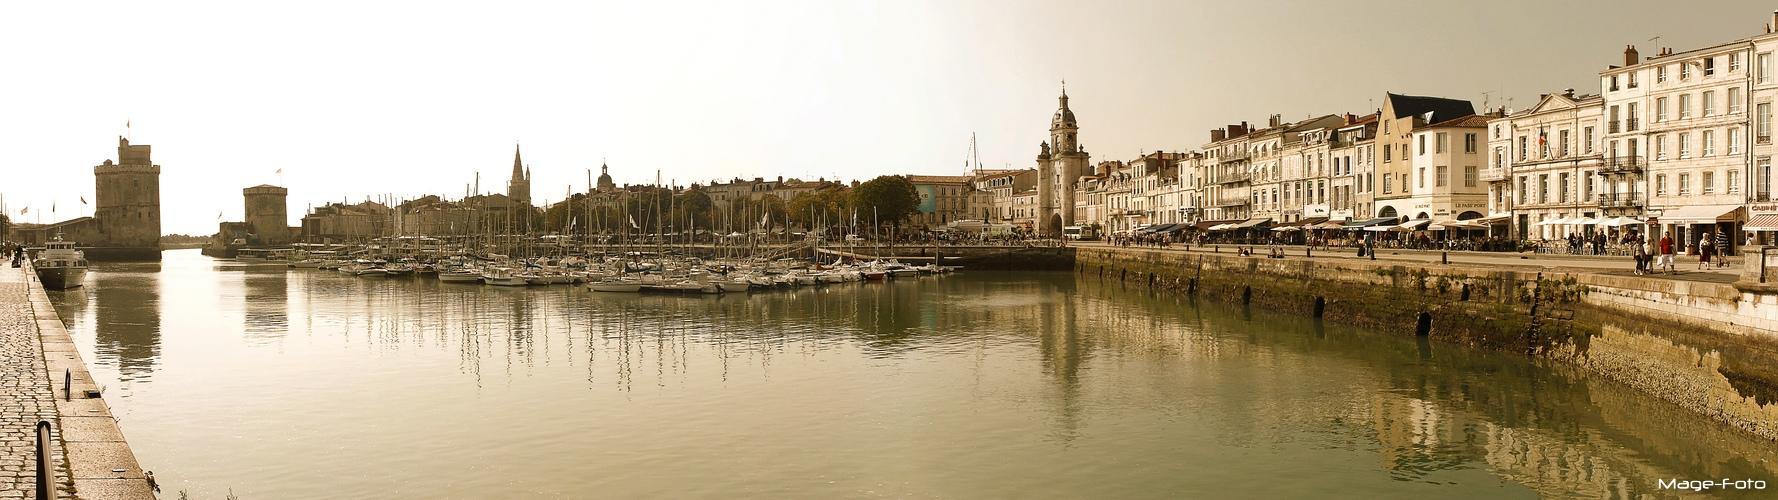 La Rochelle - Alter Hafen Panorama